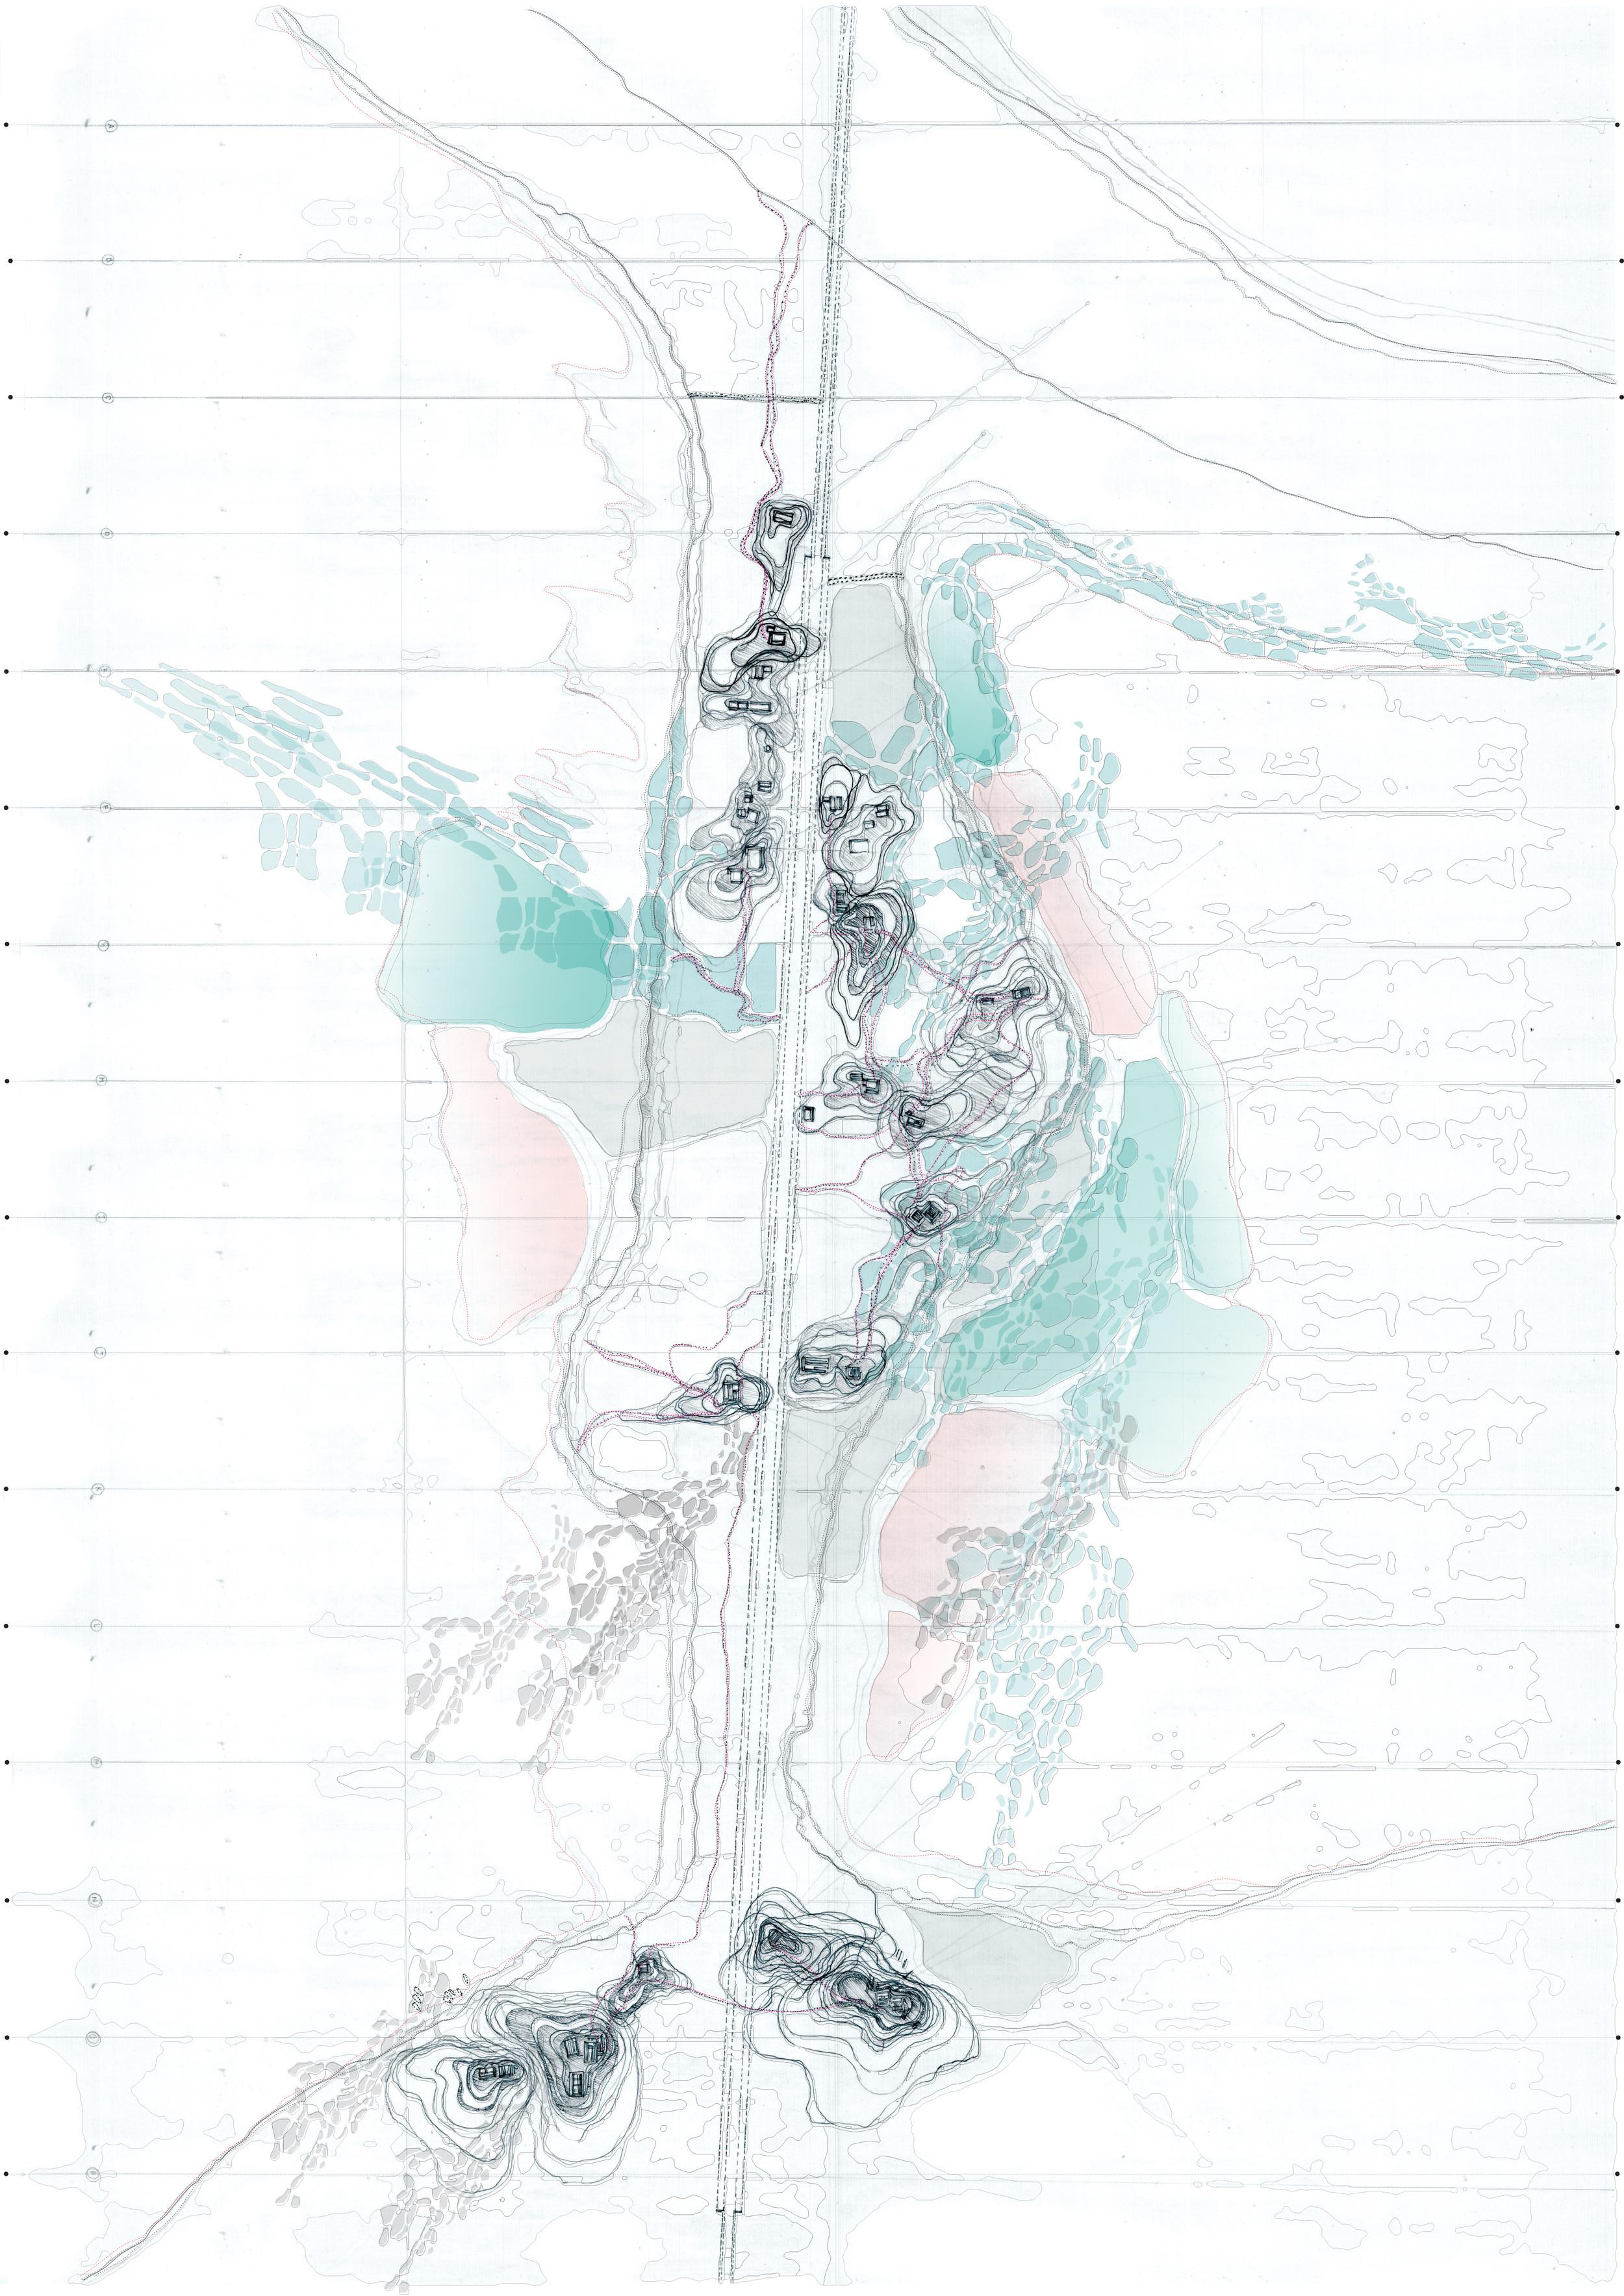 150618 Site Proposal Drawing final.jpg